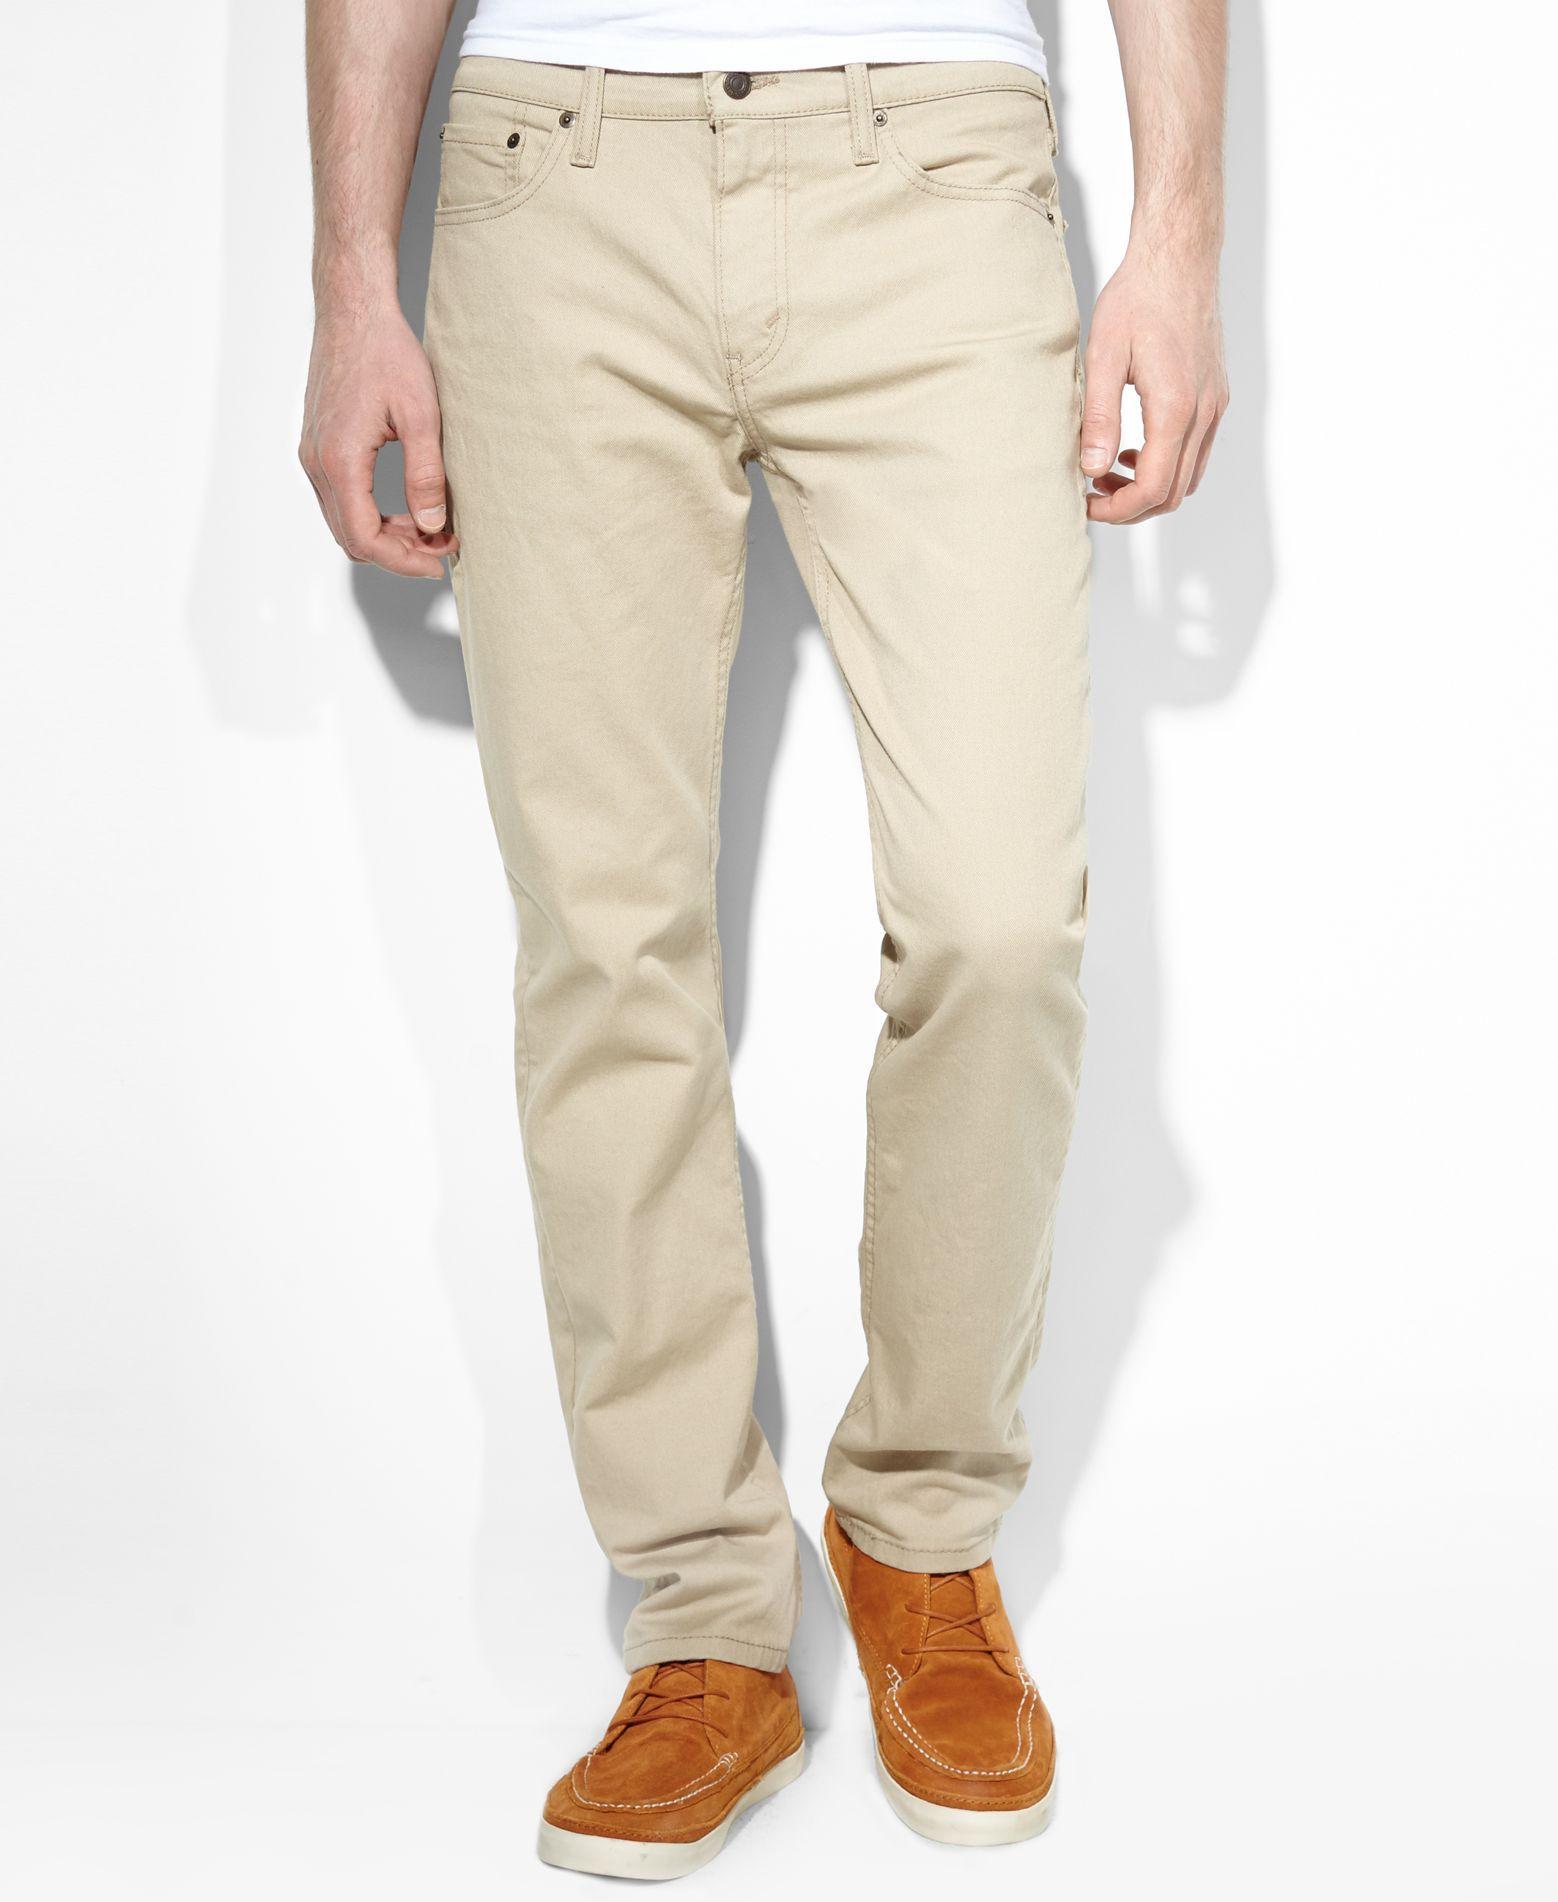 76edf3b2222a1 Levi s 511 Slim-Fit True-Chino Jeans - Levi s 511  Slim - Men - Macy s